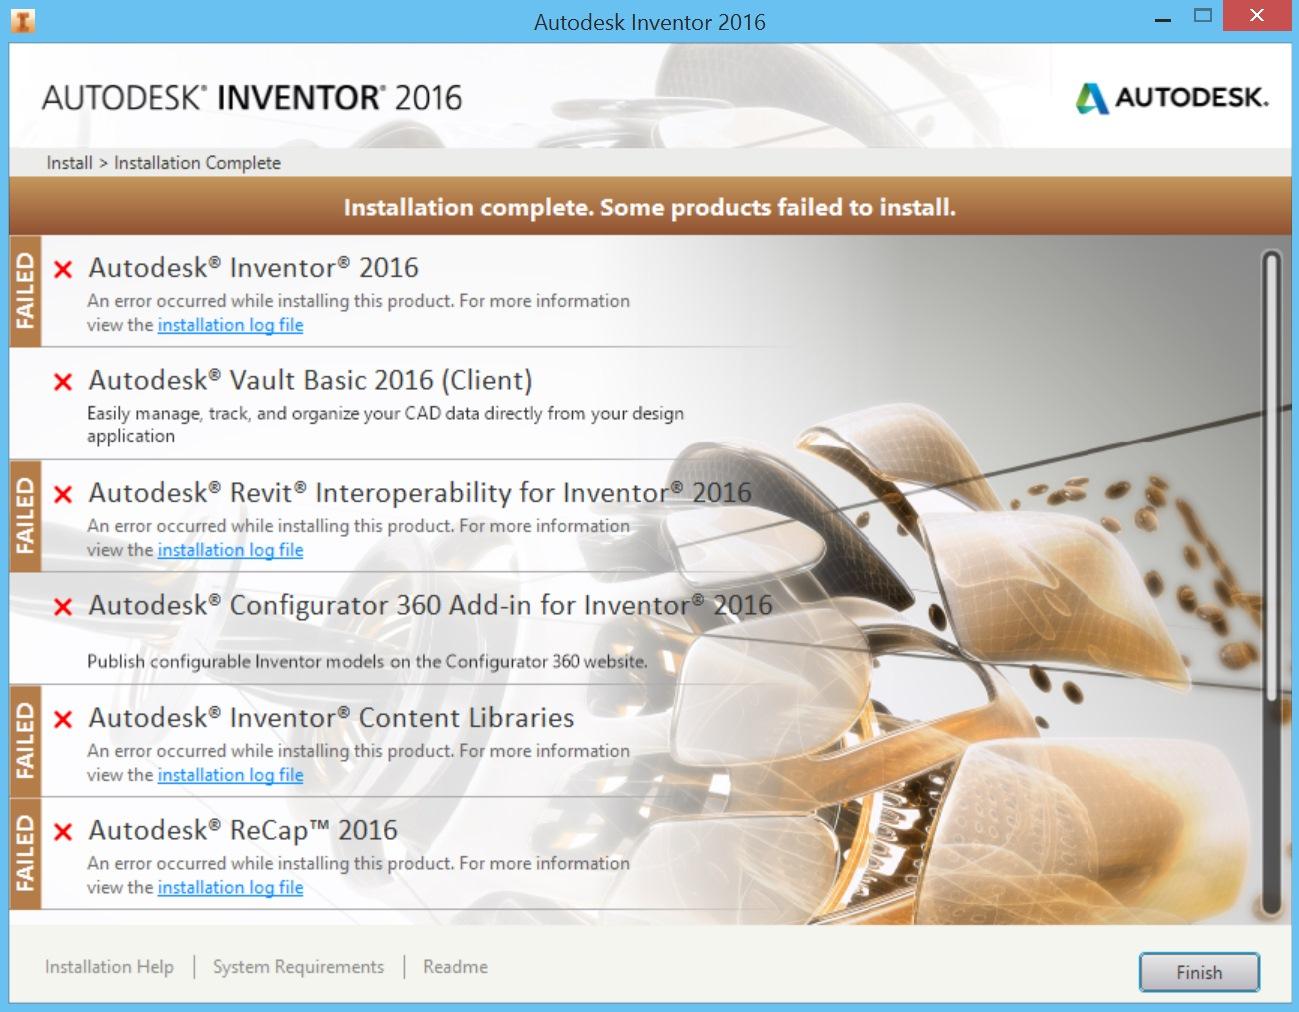 Downloading Autodesk Inventor 2016 Problems - Autodesk